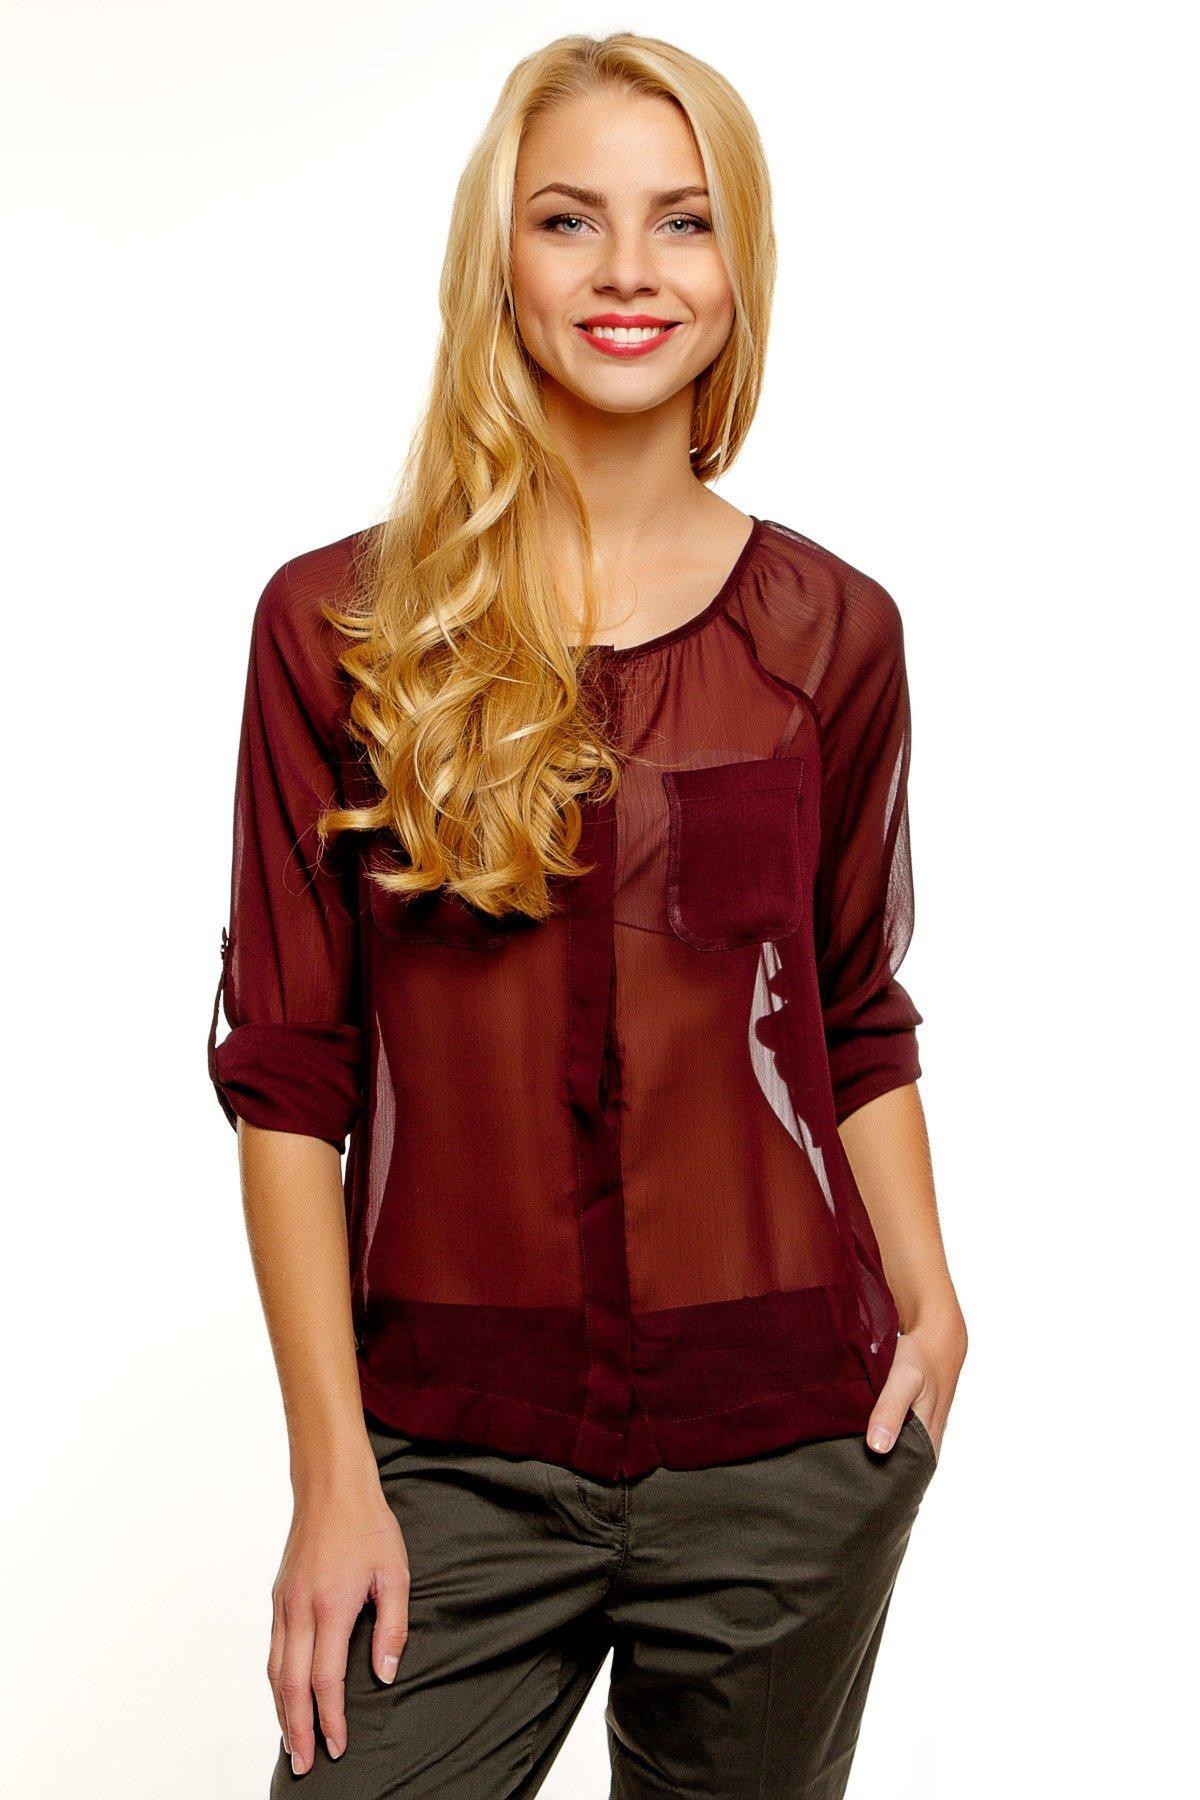 фото блузка натянутая на груди